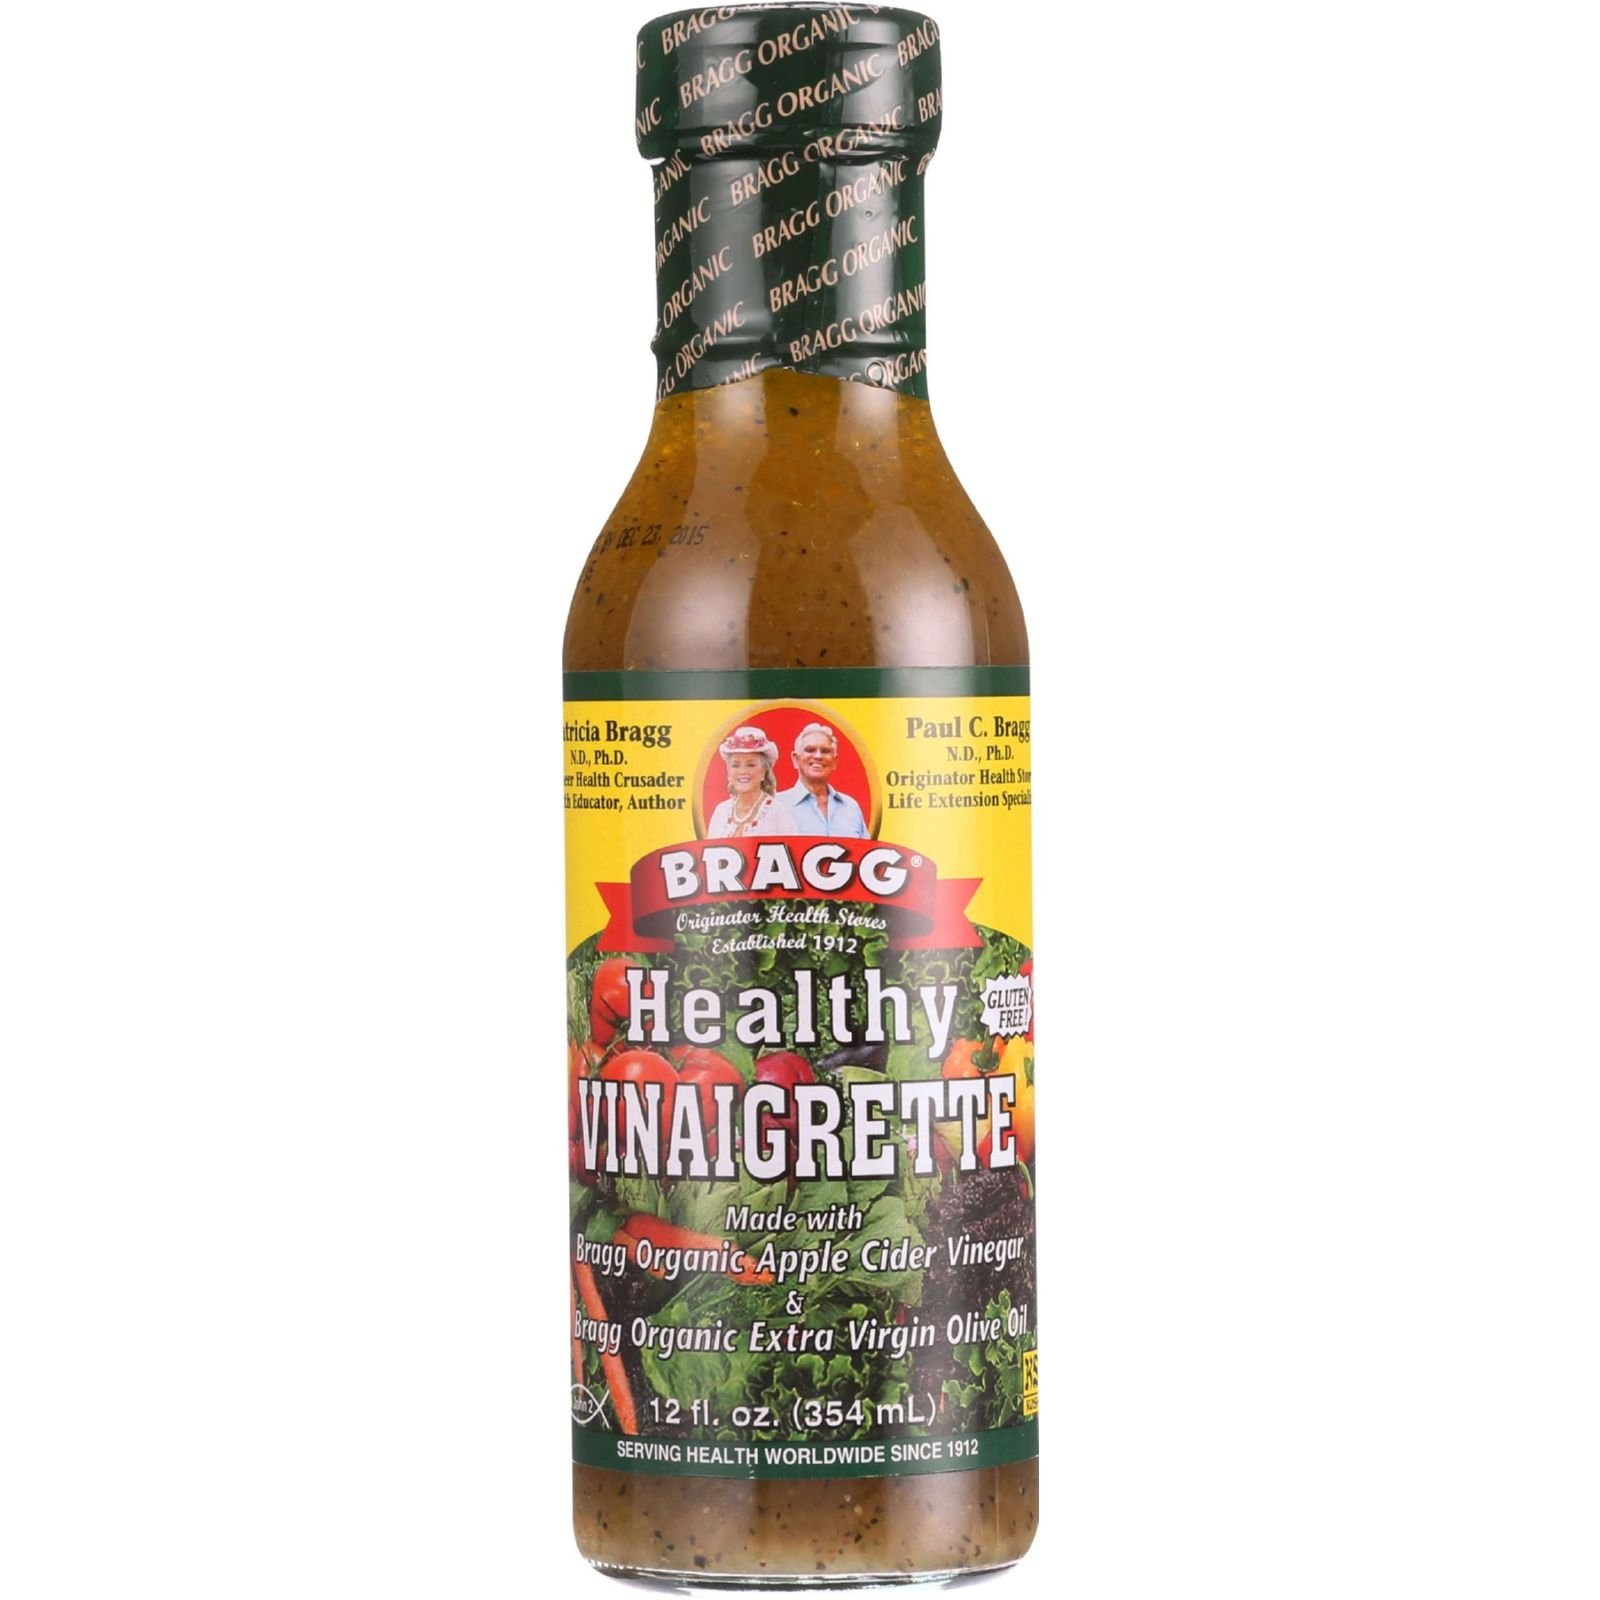 Bragg Vinaigrette - Organic - Healthy - 12 oz - case of 6 - 95%+ Organic - Gluten Free - Dairy Free - - Wheat Free-Vegan by Bragg